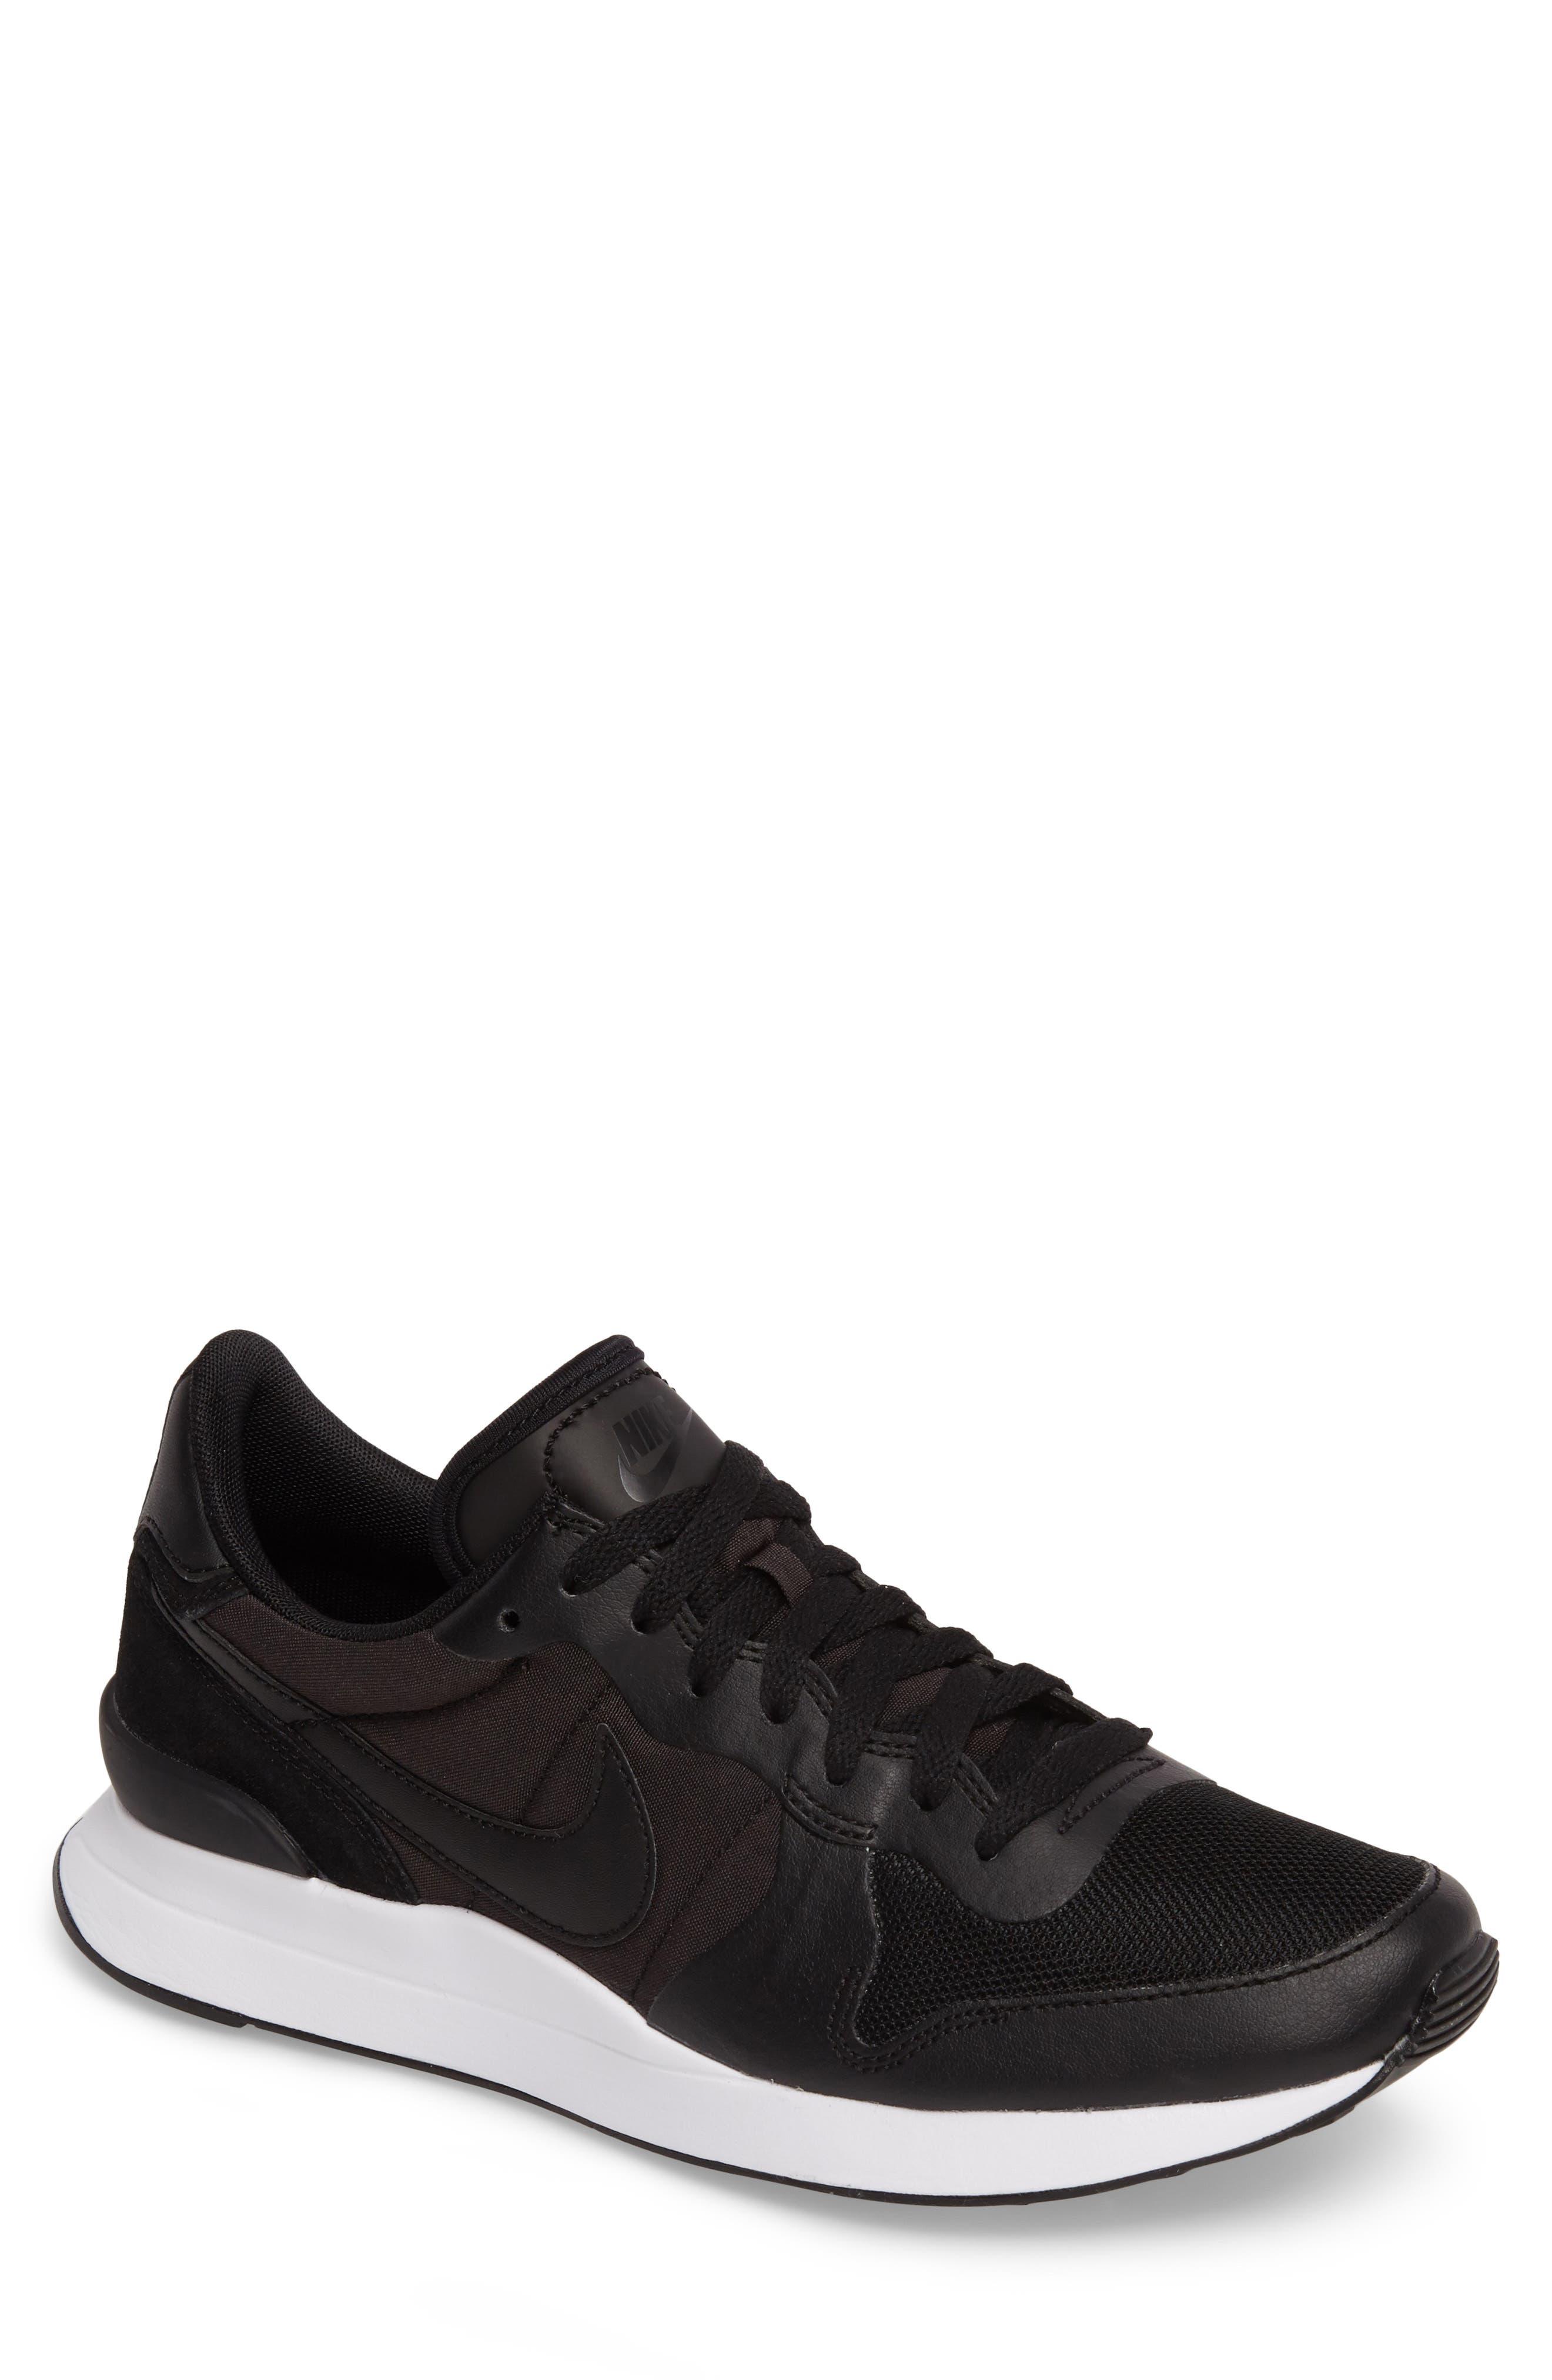 Internationalist LT17 Sneaker,                         Main,                         color,